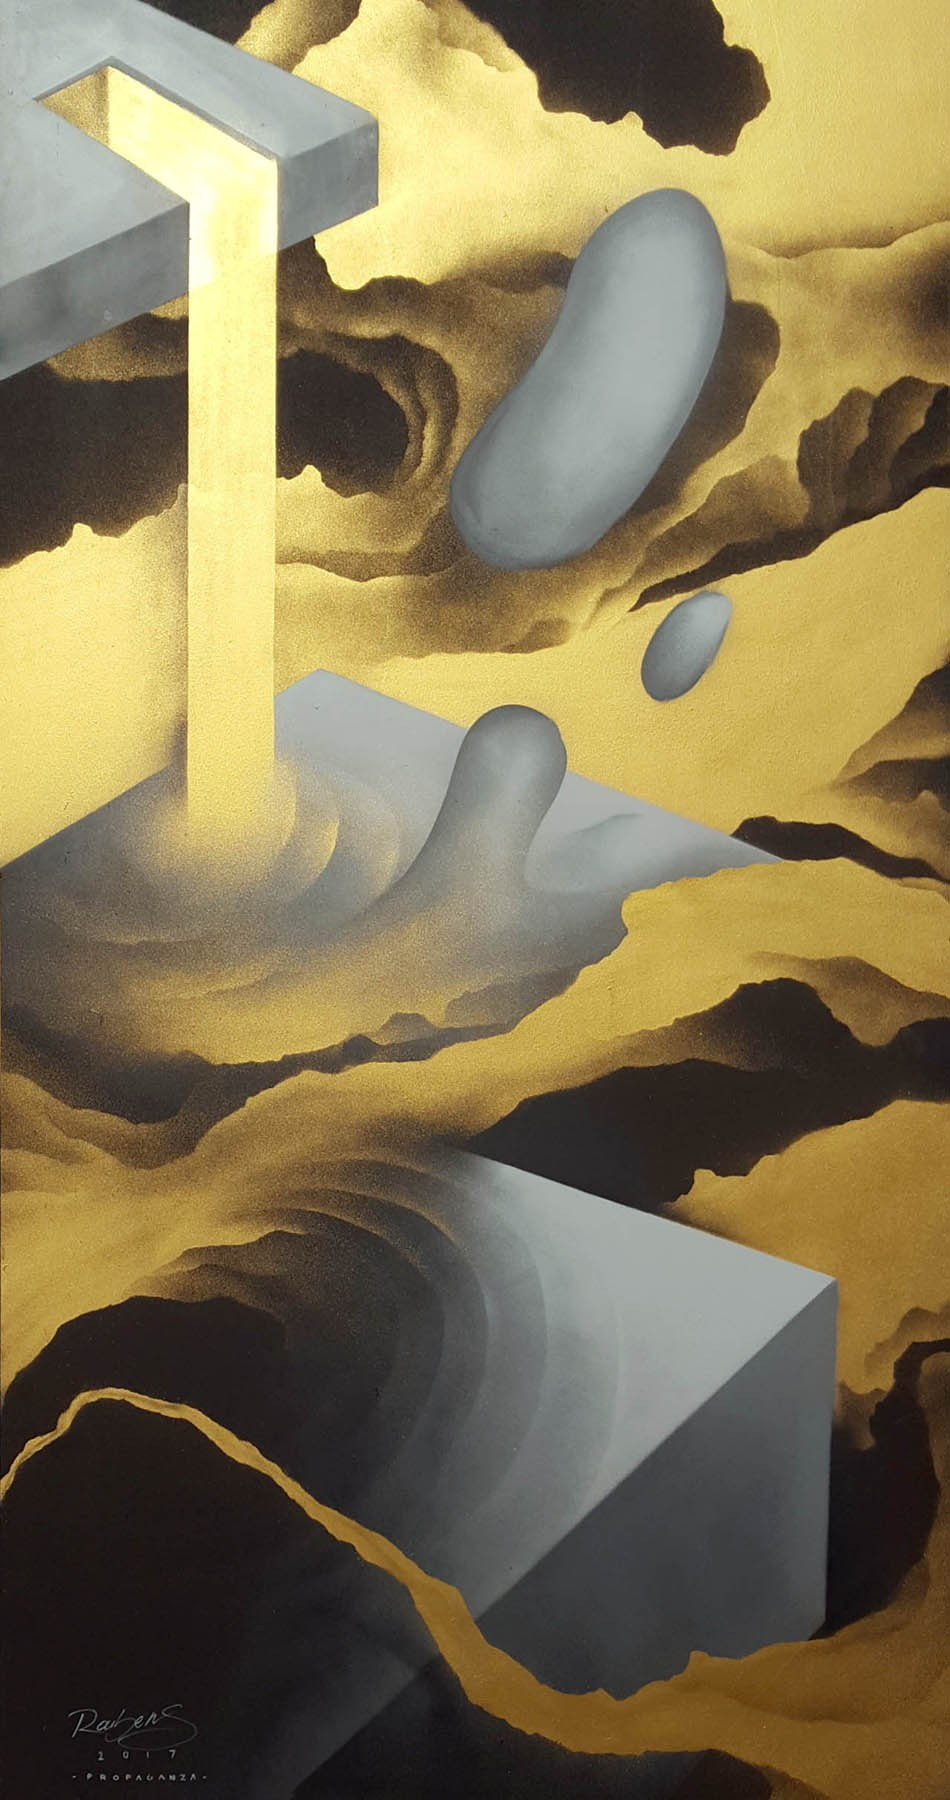 https://www.propaganza.be/wp-content/uploads/2015/09/propaganza-adrien-roubens-abstrait-abstract-urban-artist-graffiti-graff-street-art-spray-paint-painting-bruxelles-4.jpg